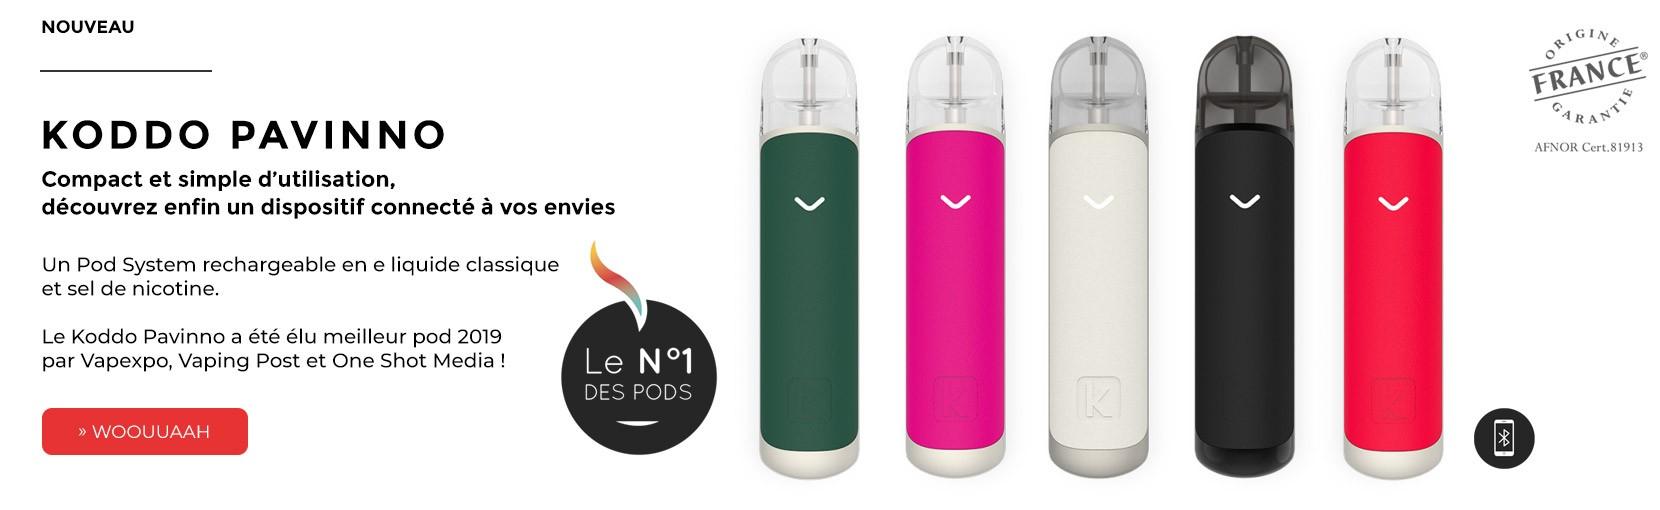 Koddo Pavinno Cigarette électronique Pod System